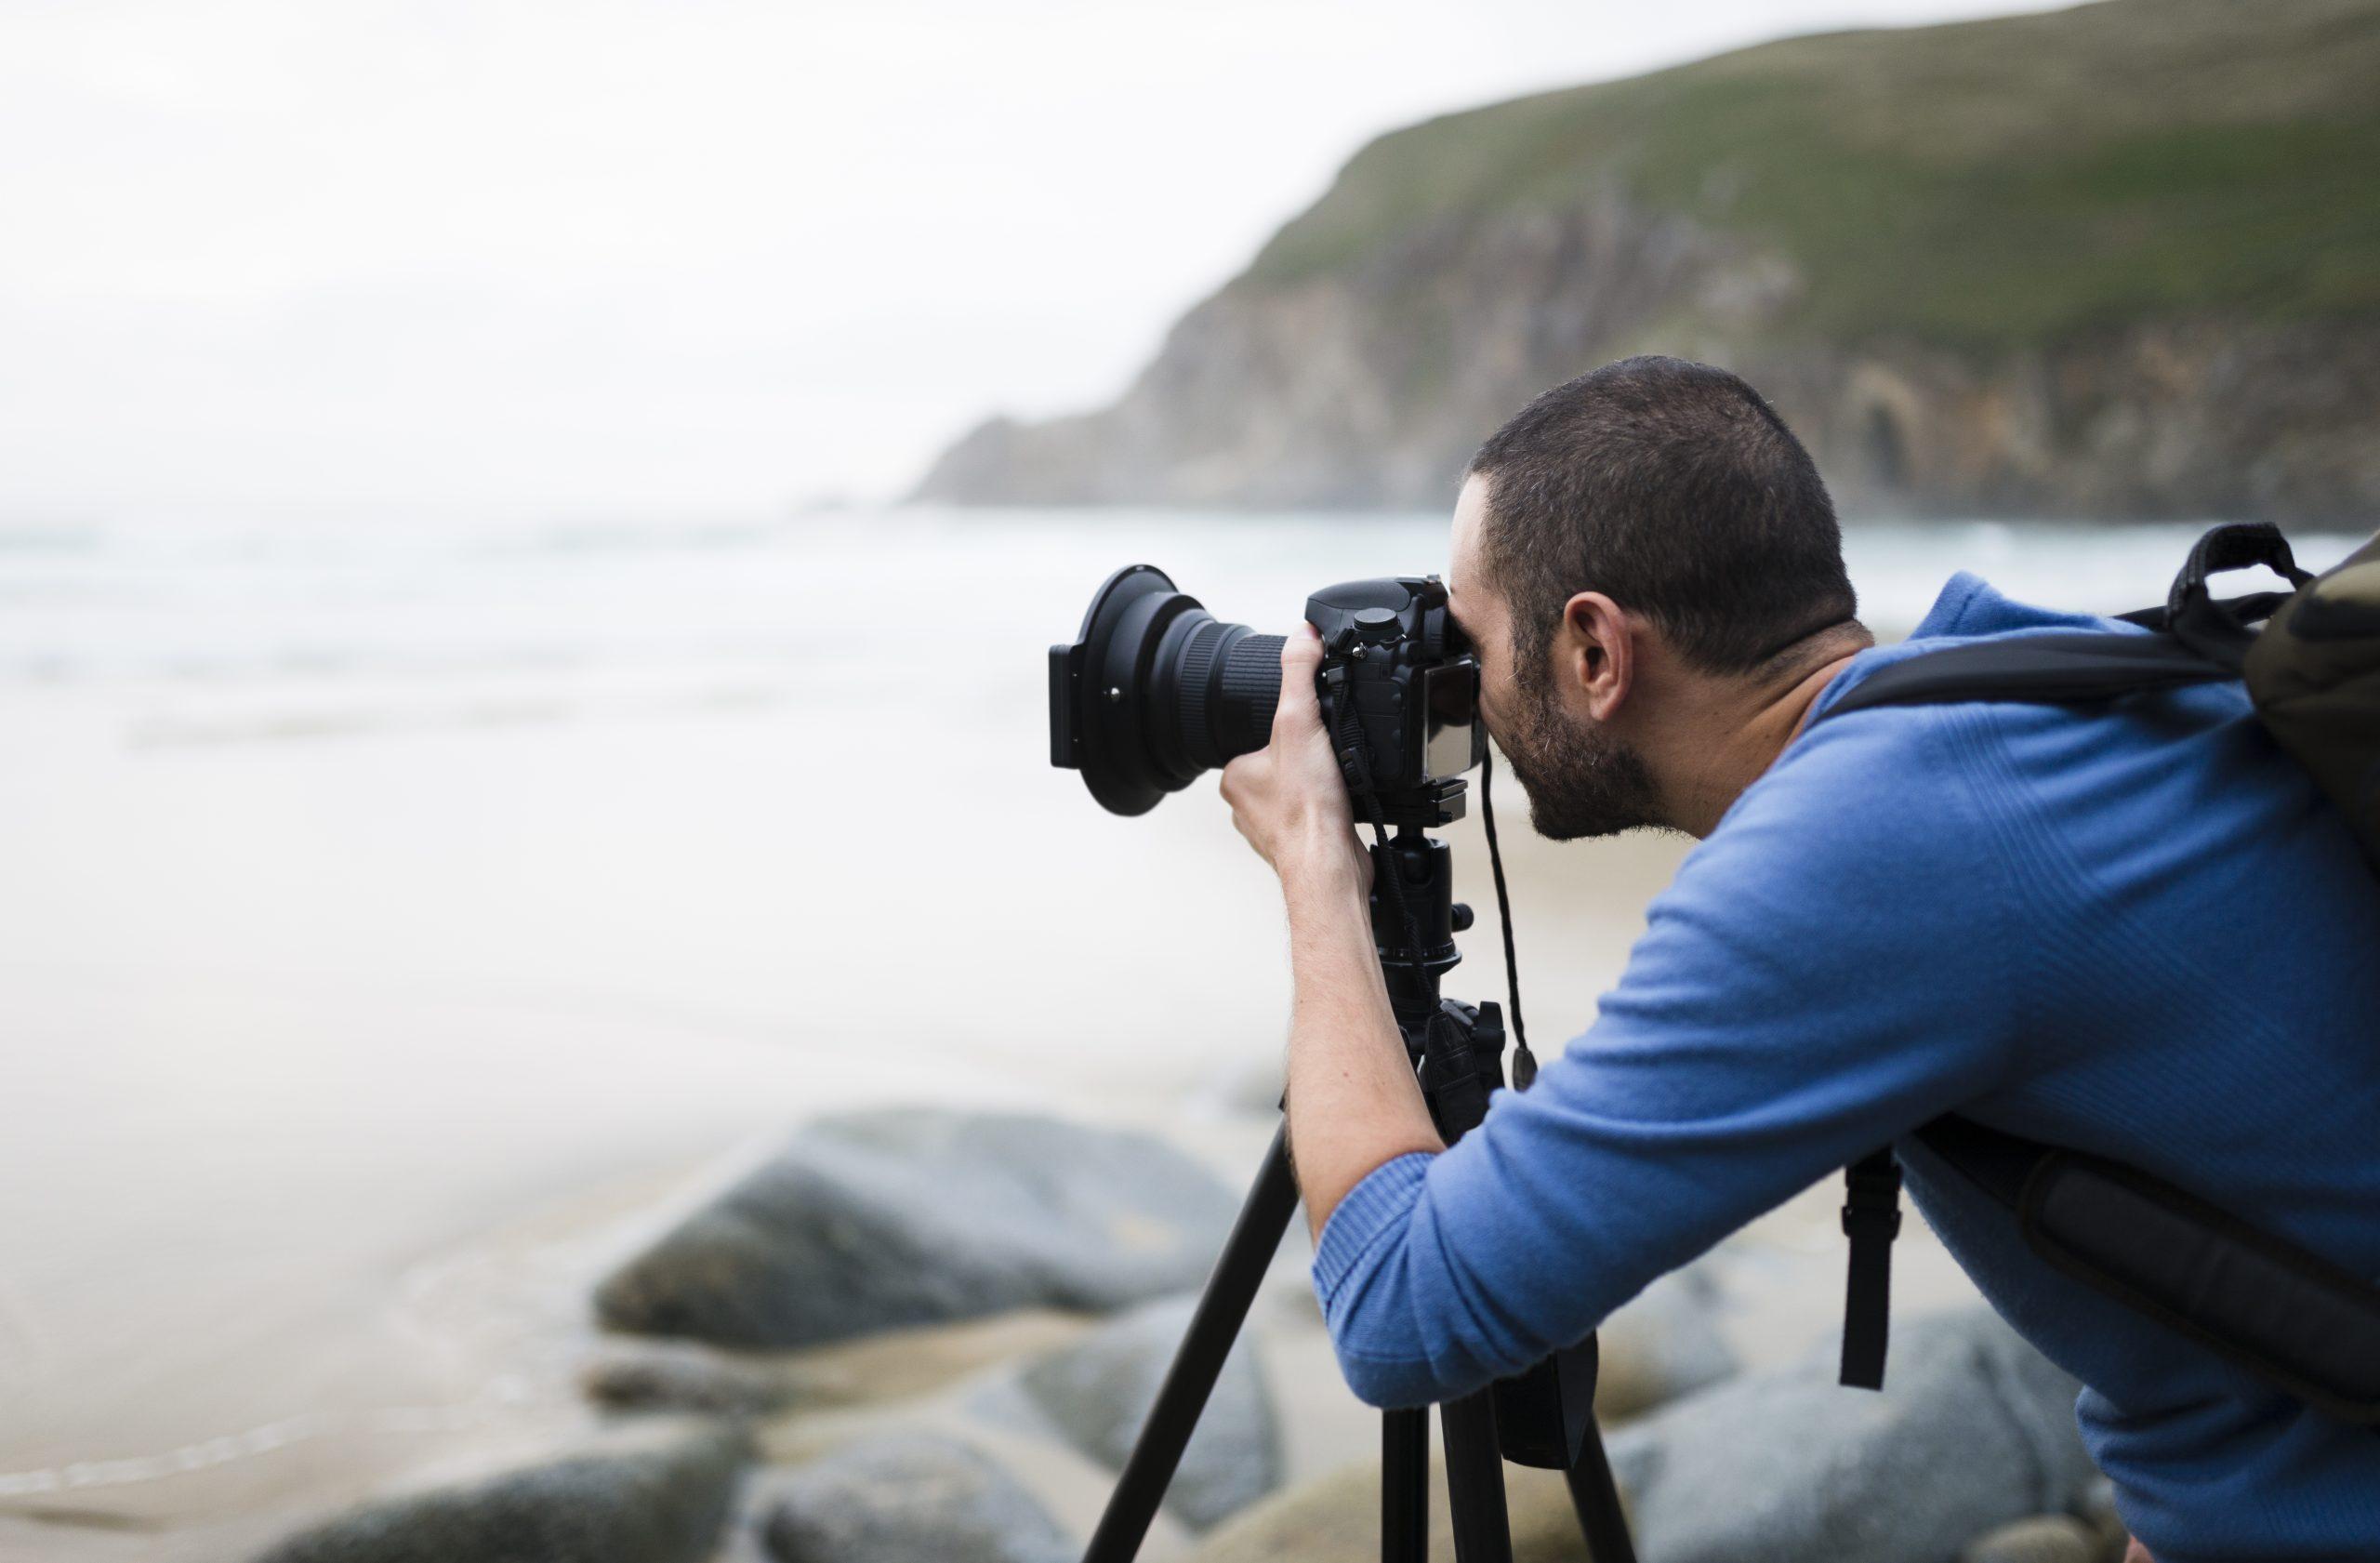 Fotograf mit Kamera für APA-Fotoservice